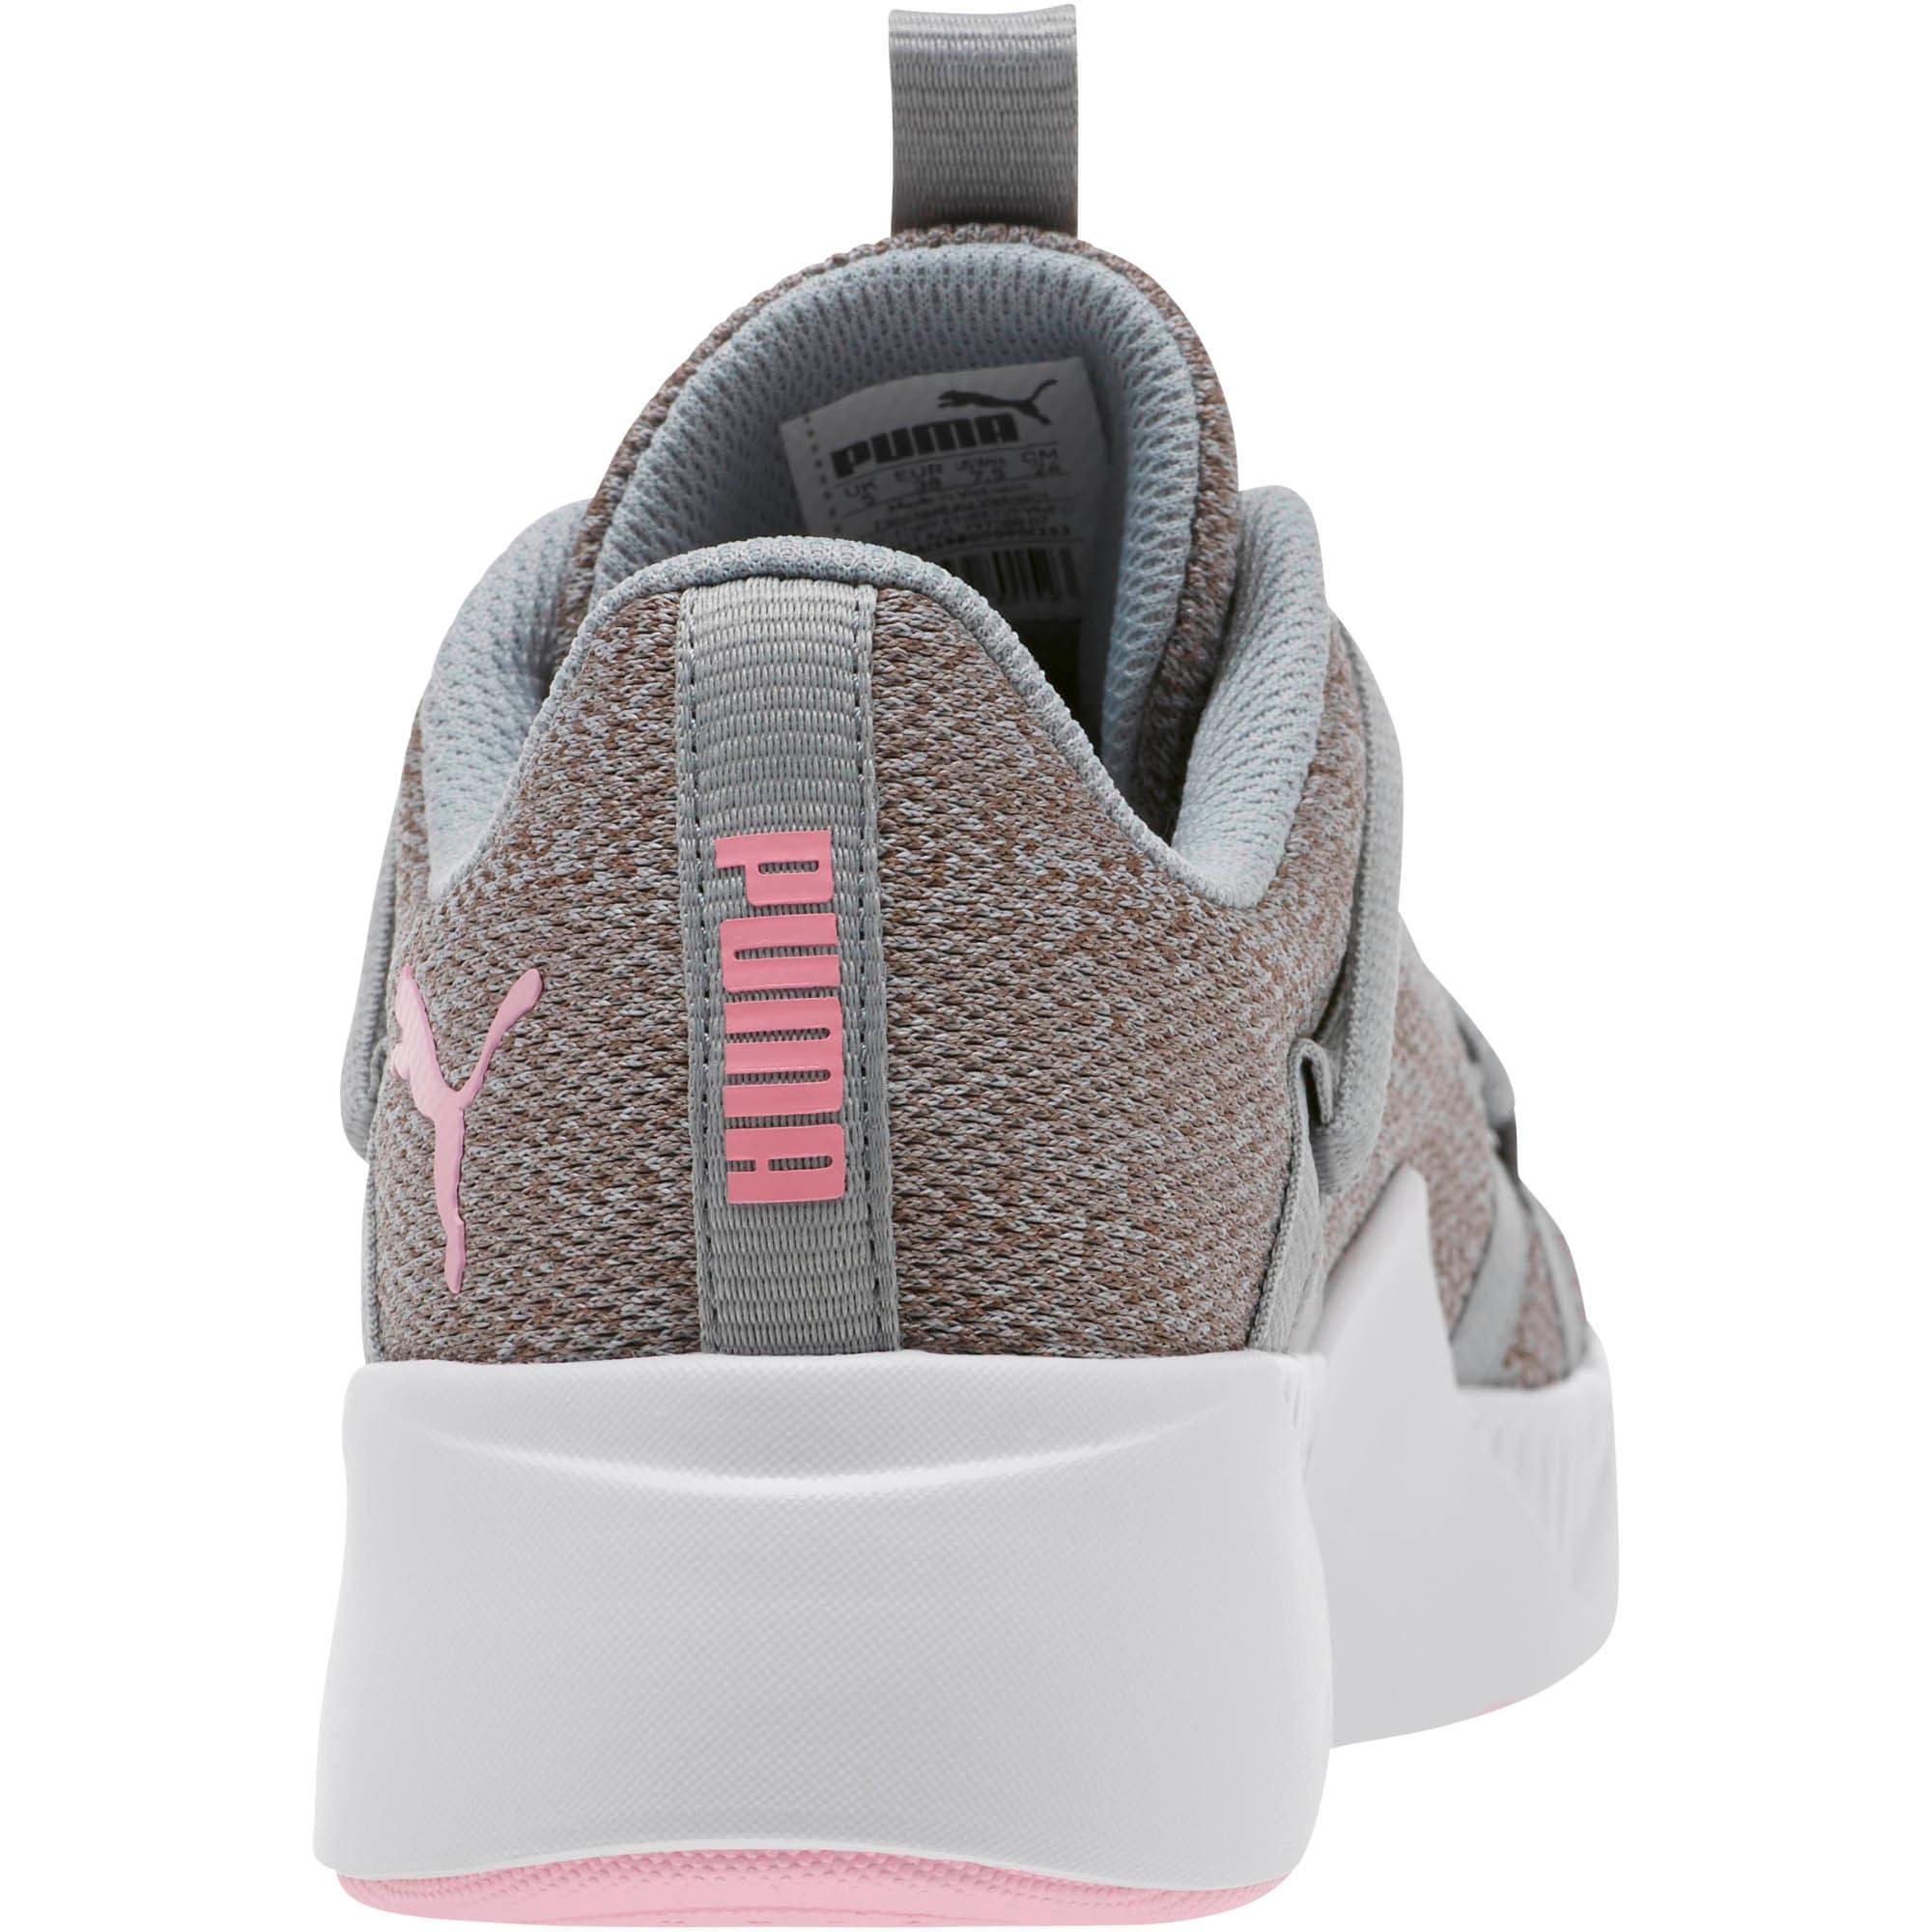 Thumbnail 4 of Incite Knit Women's Training Shoes, Quarry-Pale Pink, medium